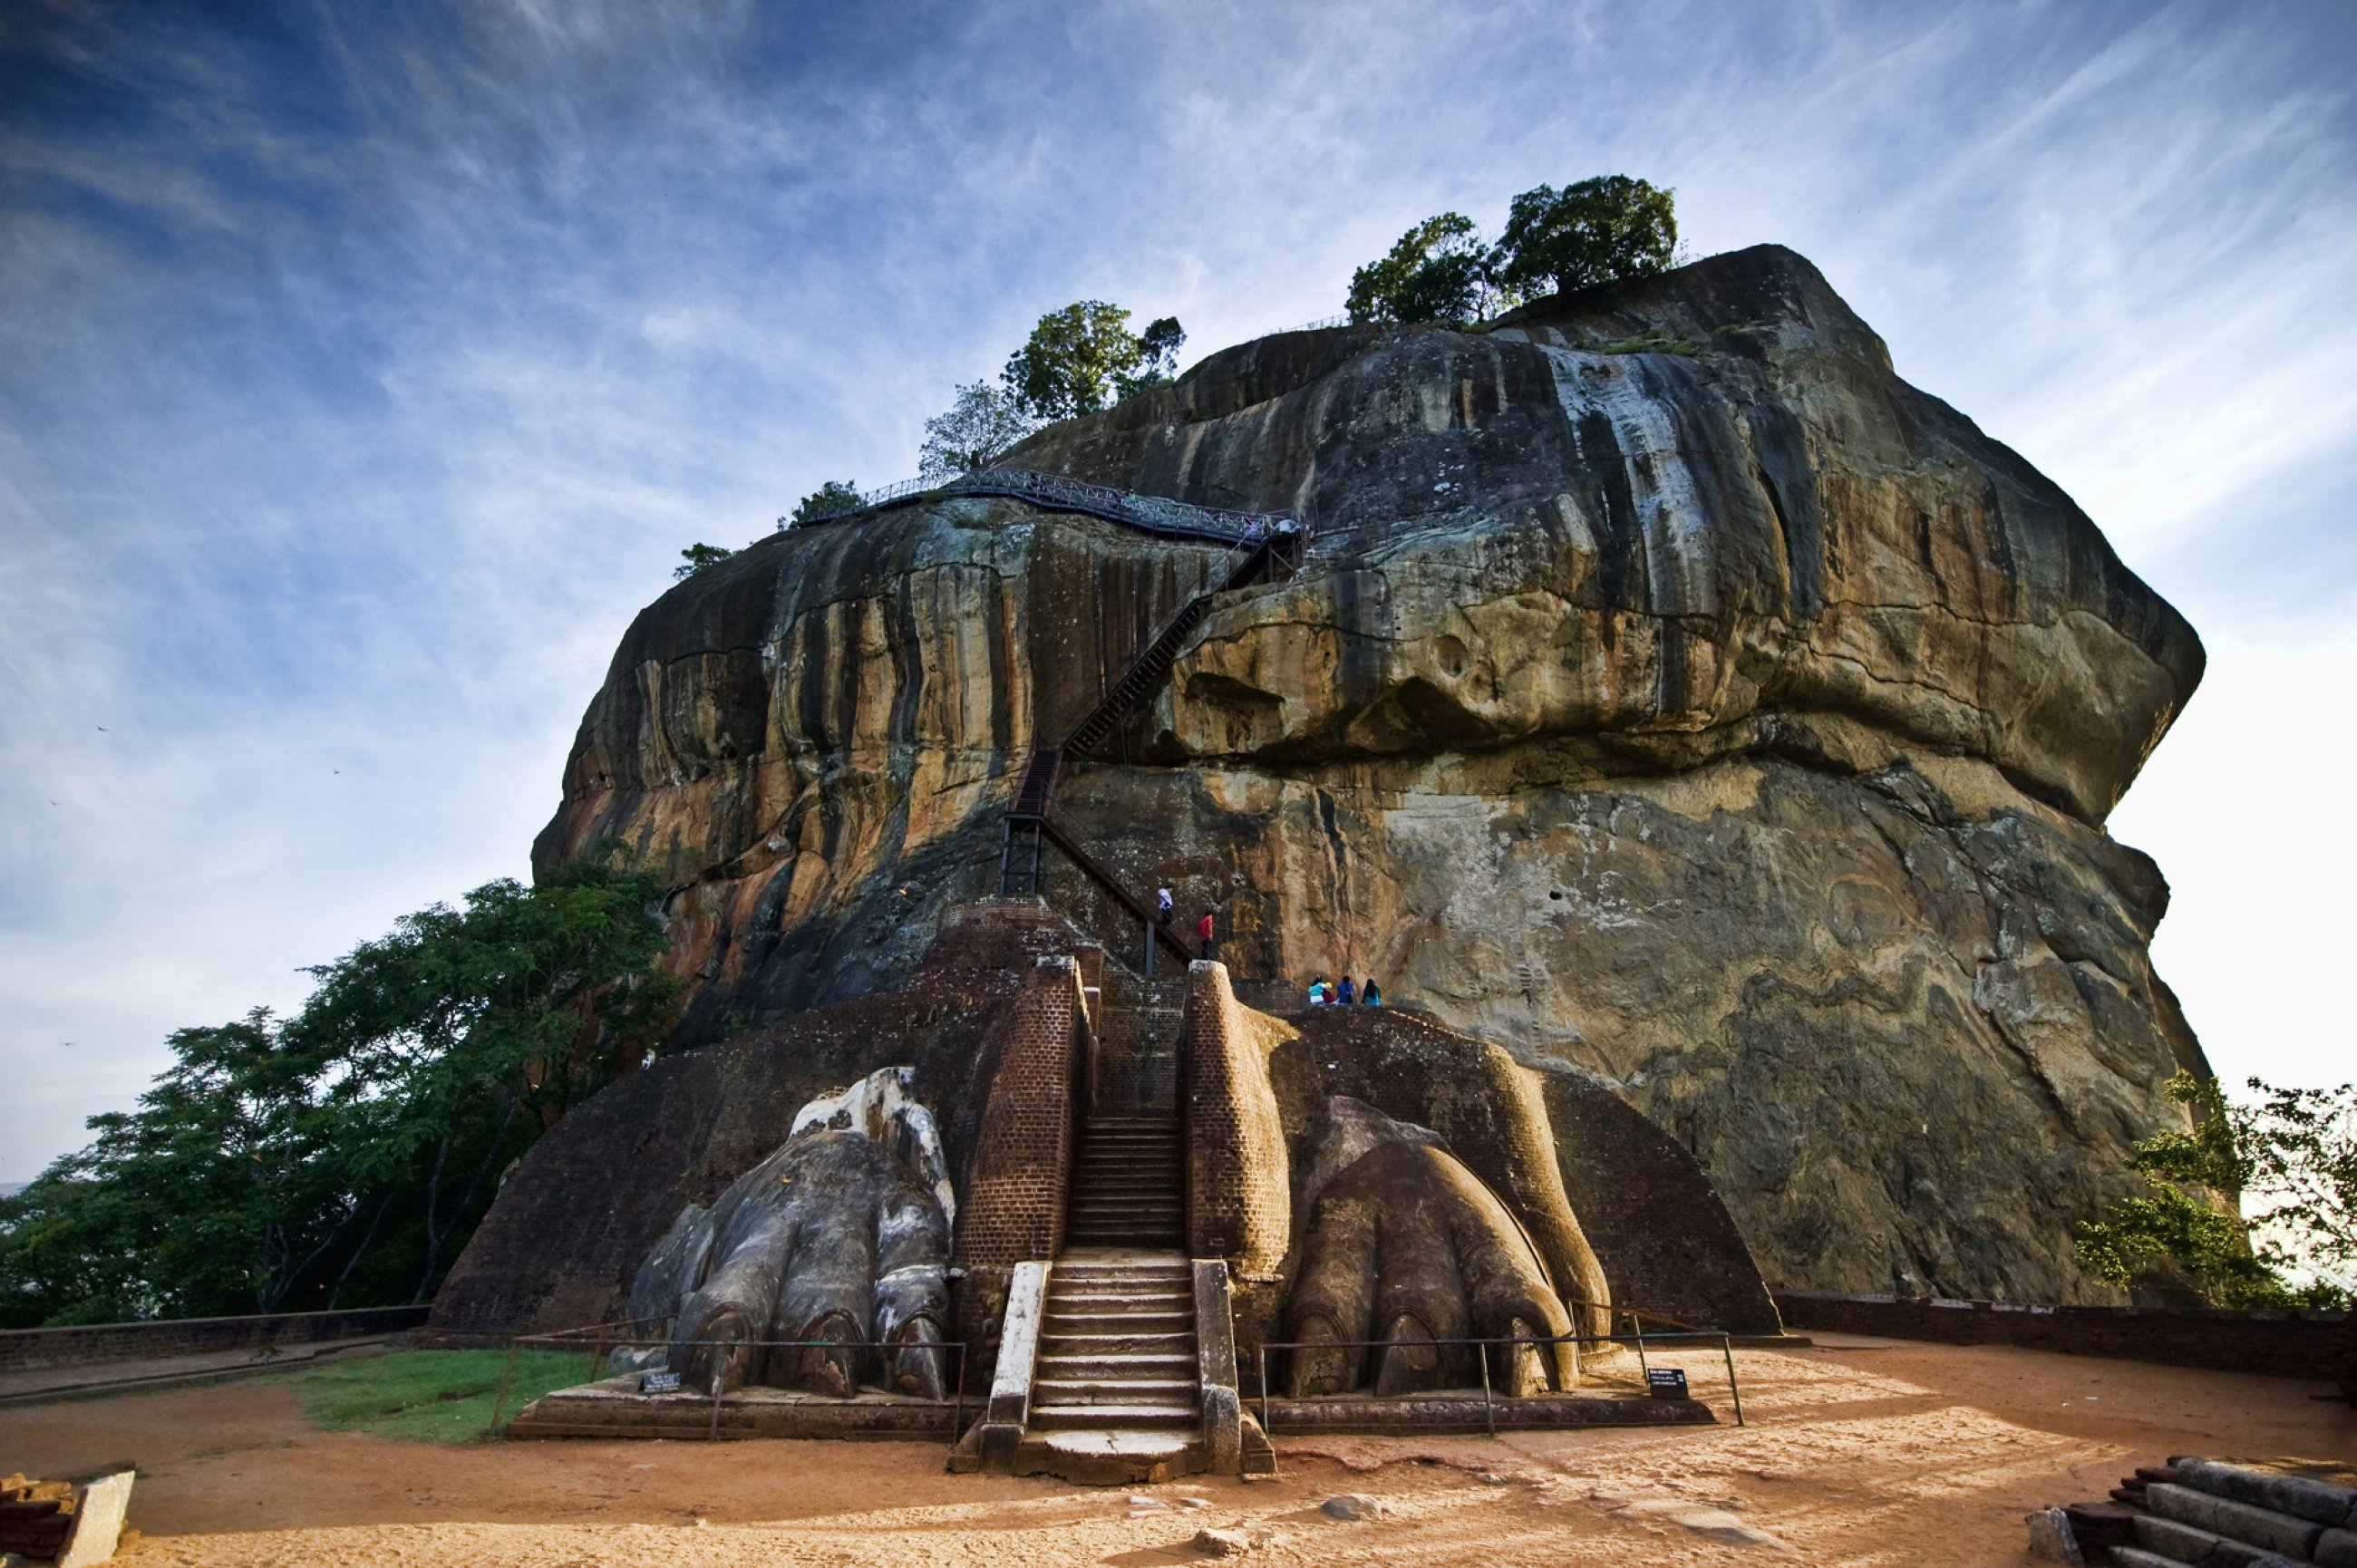 https://bubo.sk/uploads/galleries/7543/sri-lanka-lion-rock-sigiriya-dreamstime-xl-16813731.jpg